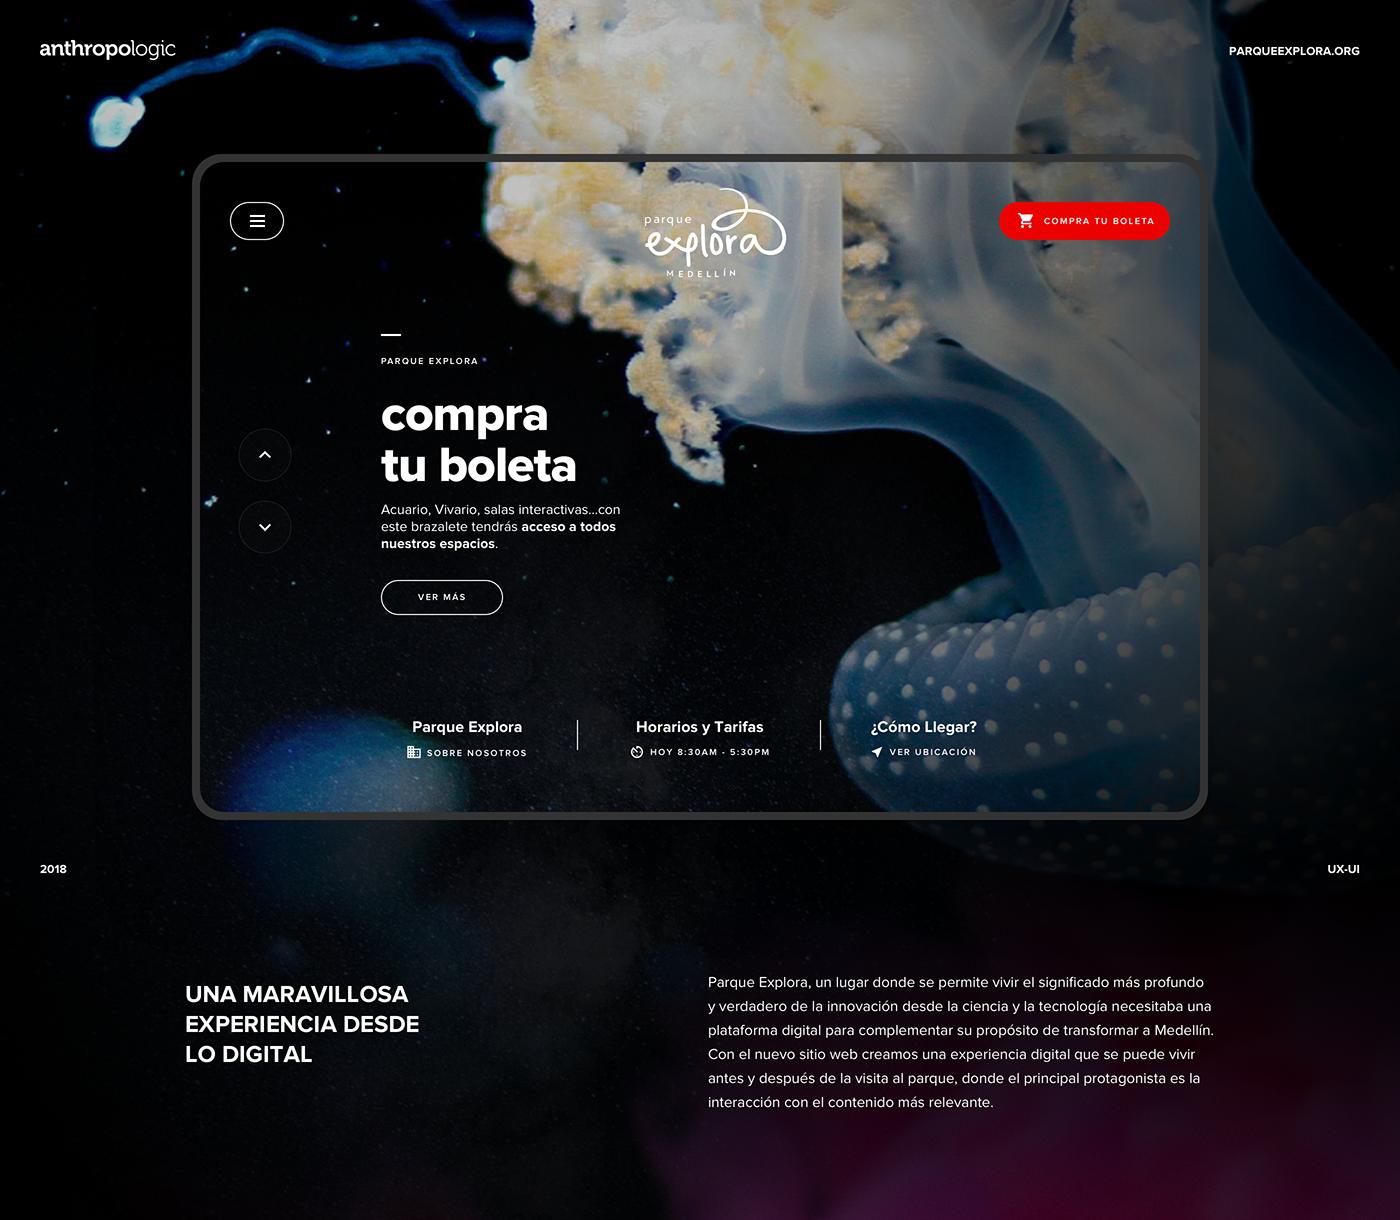 museum,ux,UI,intercative,culture,Technology,medellin,Photography ,Webdesign,Web